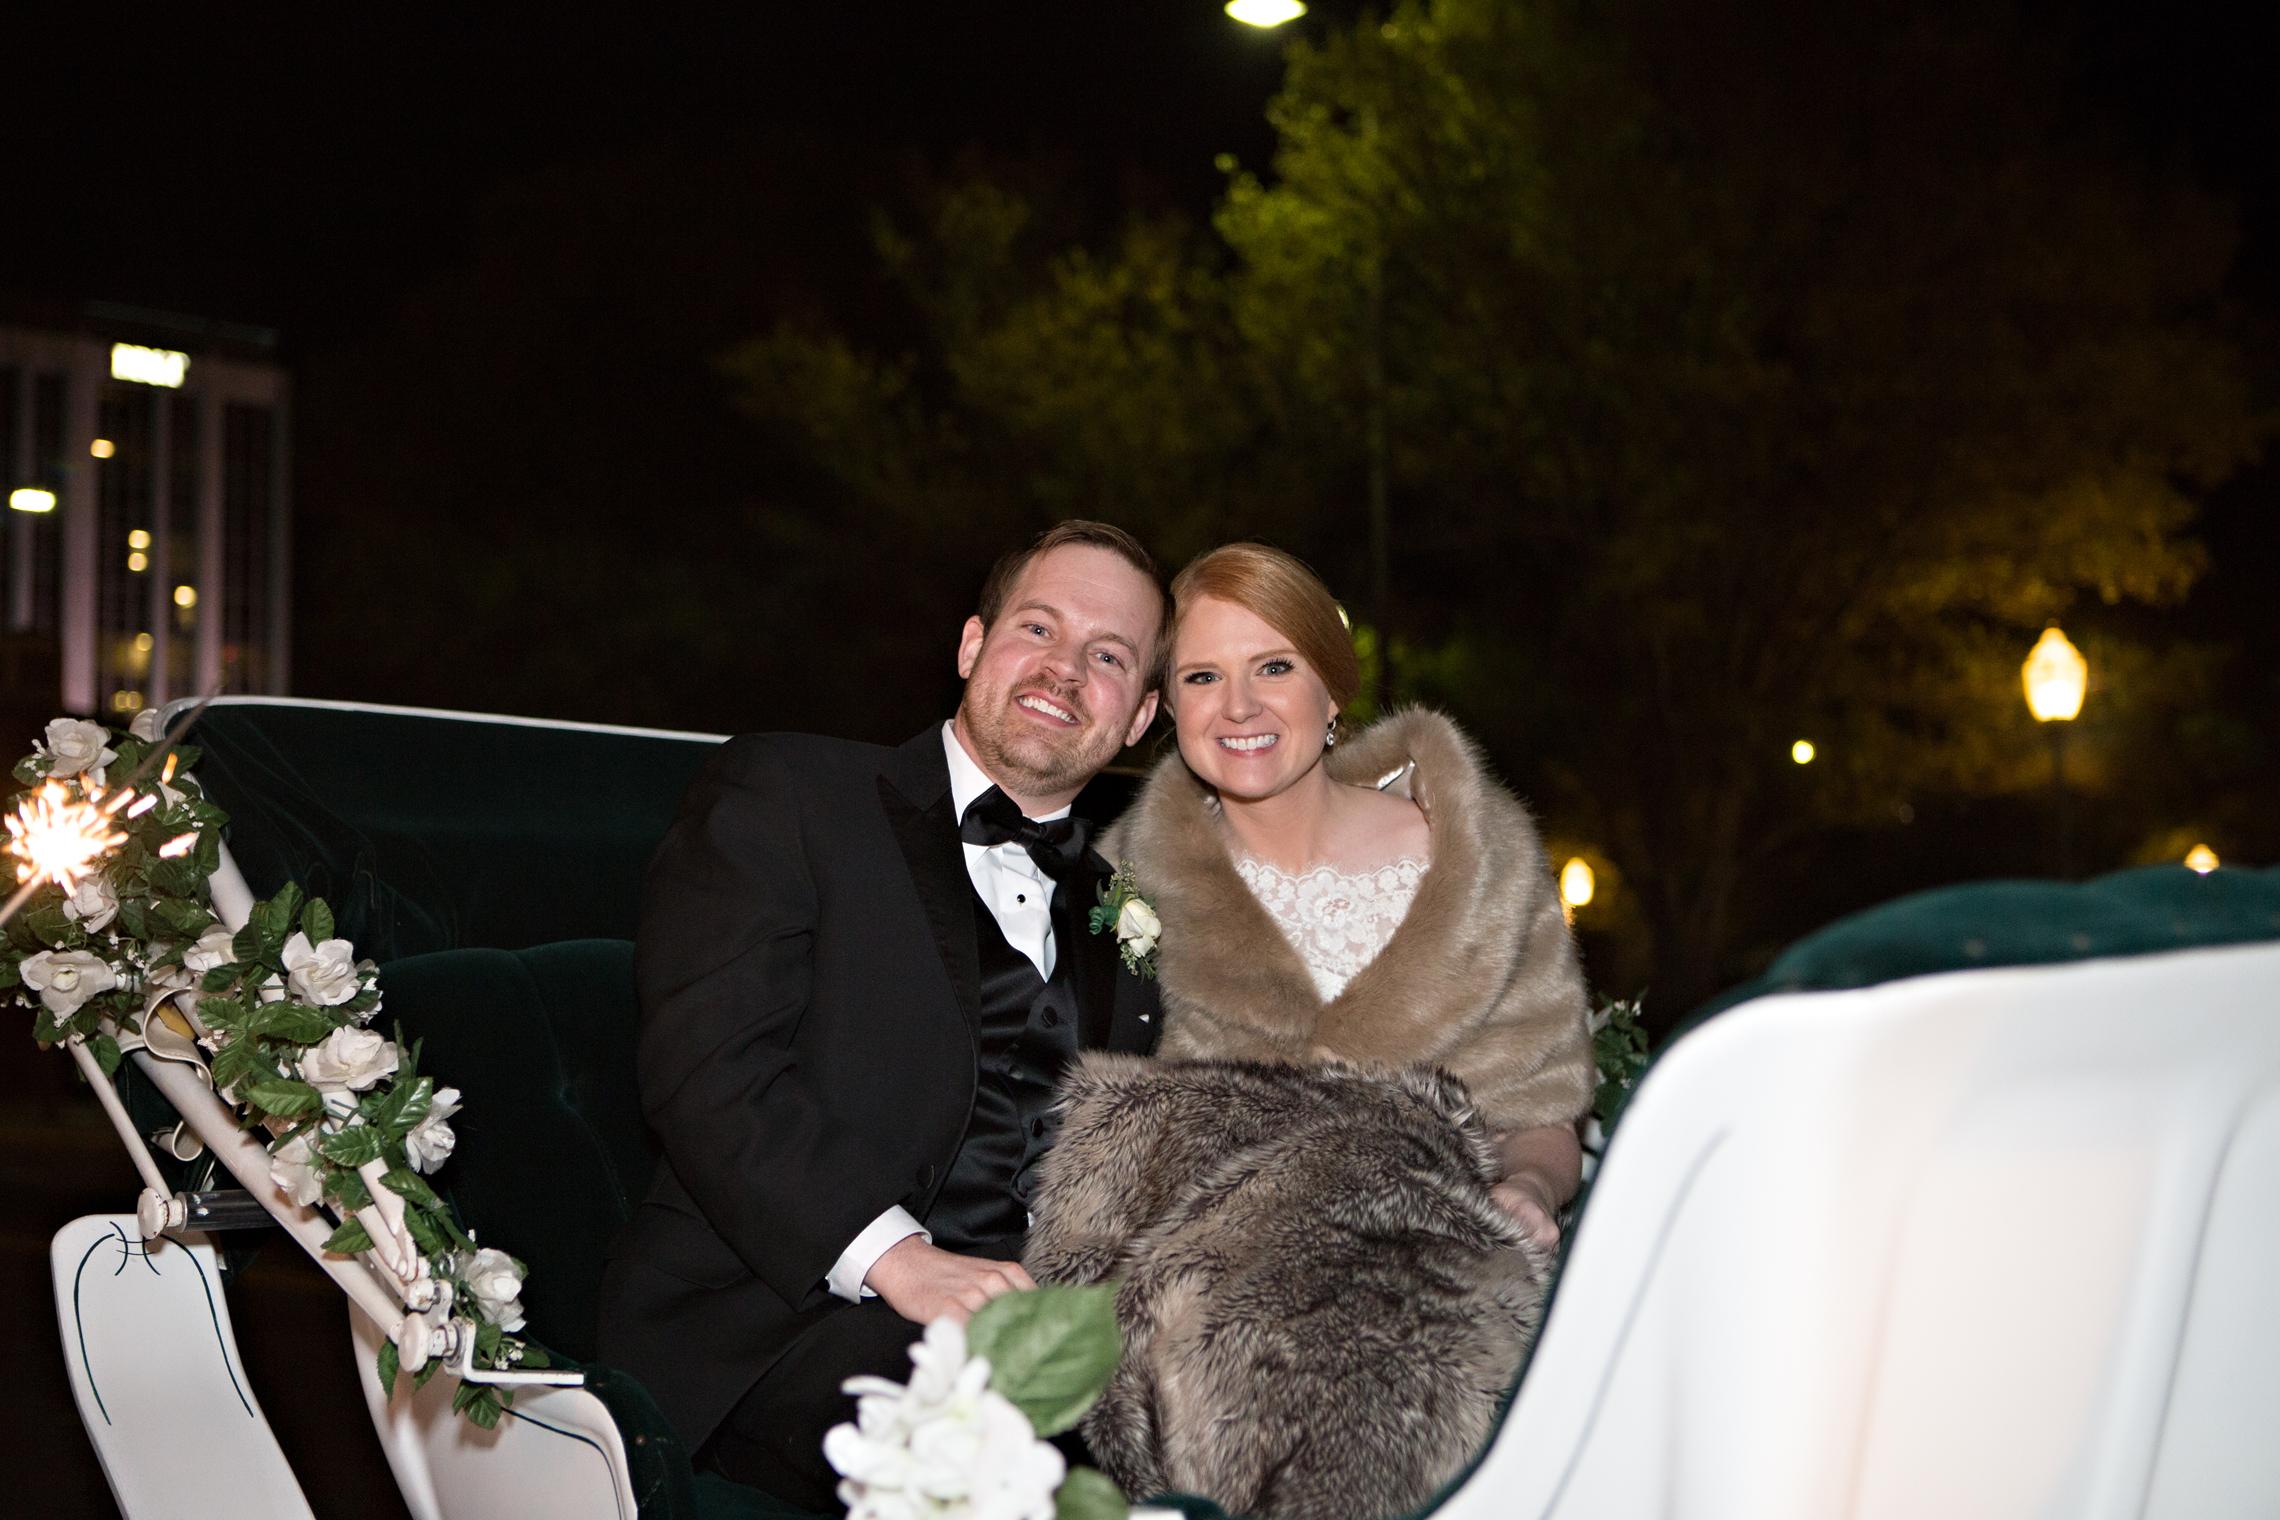 Matty-Drollette-Photography-Weddings-Montgomery-Alabama-135.jpg